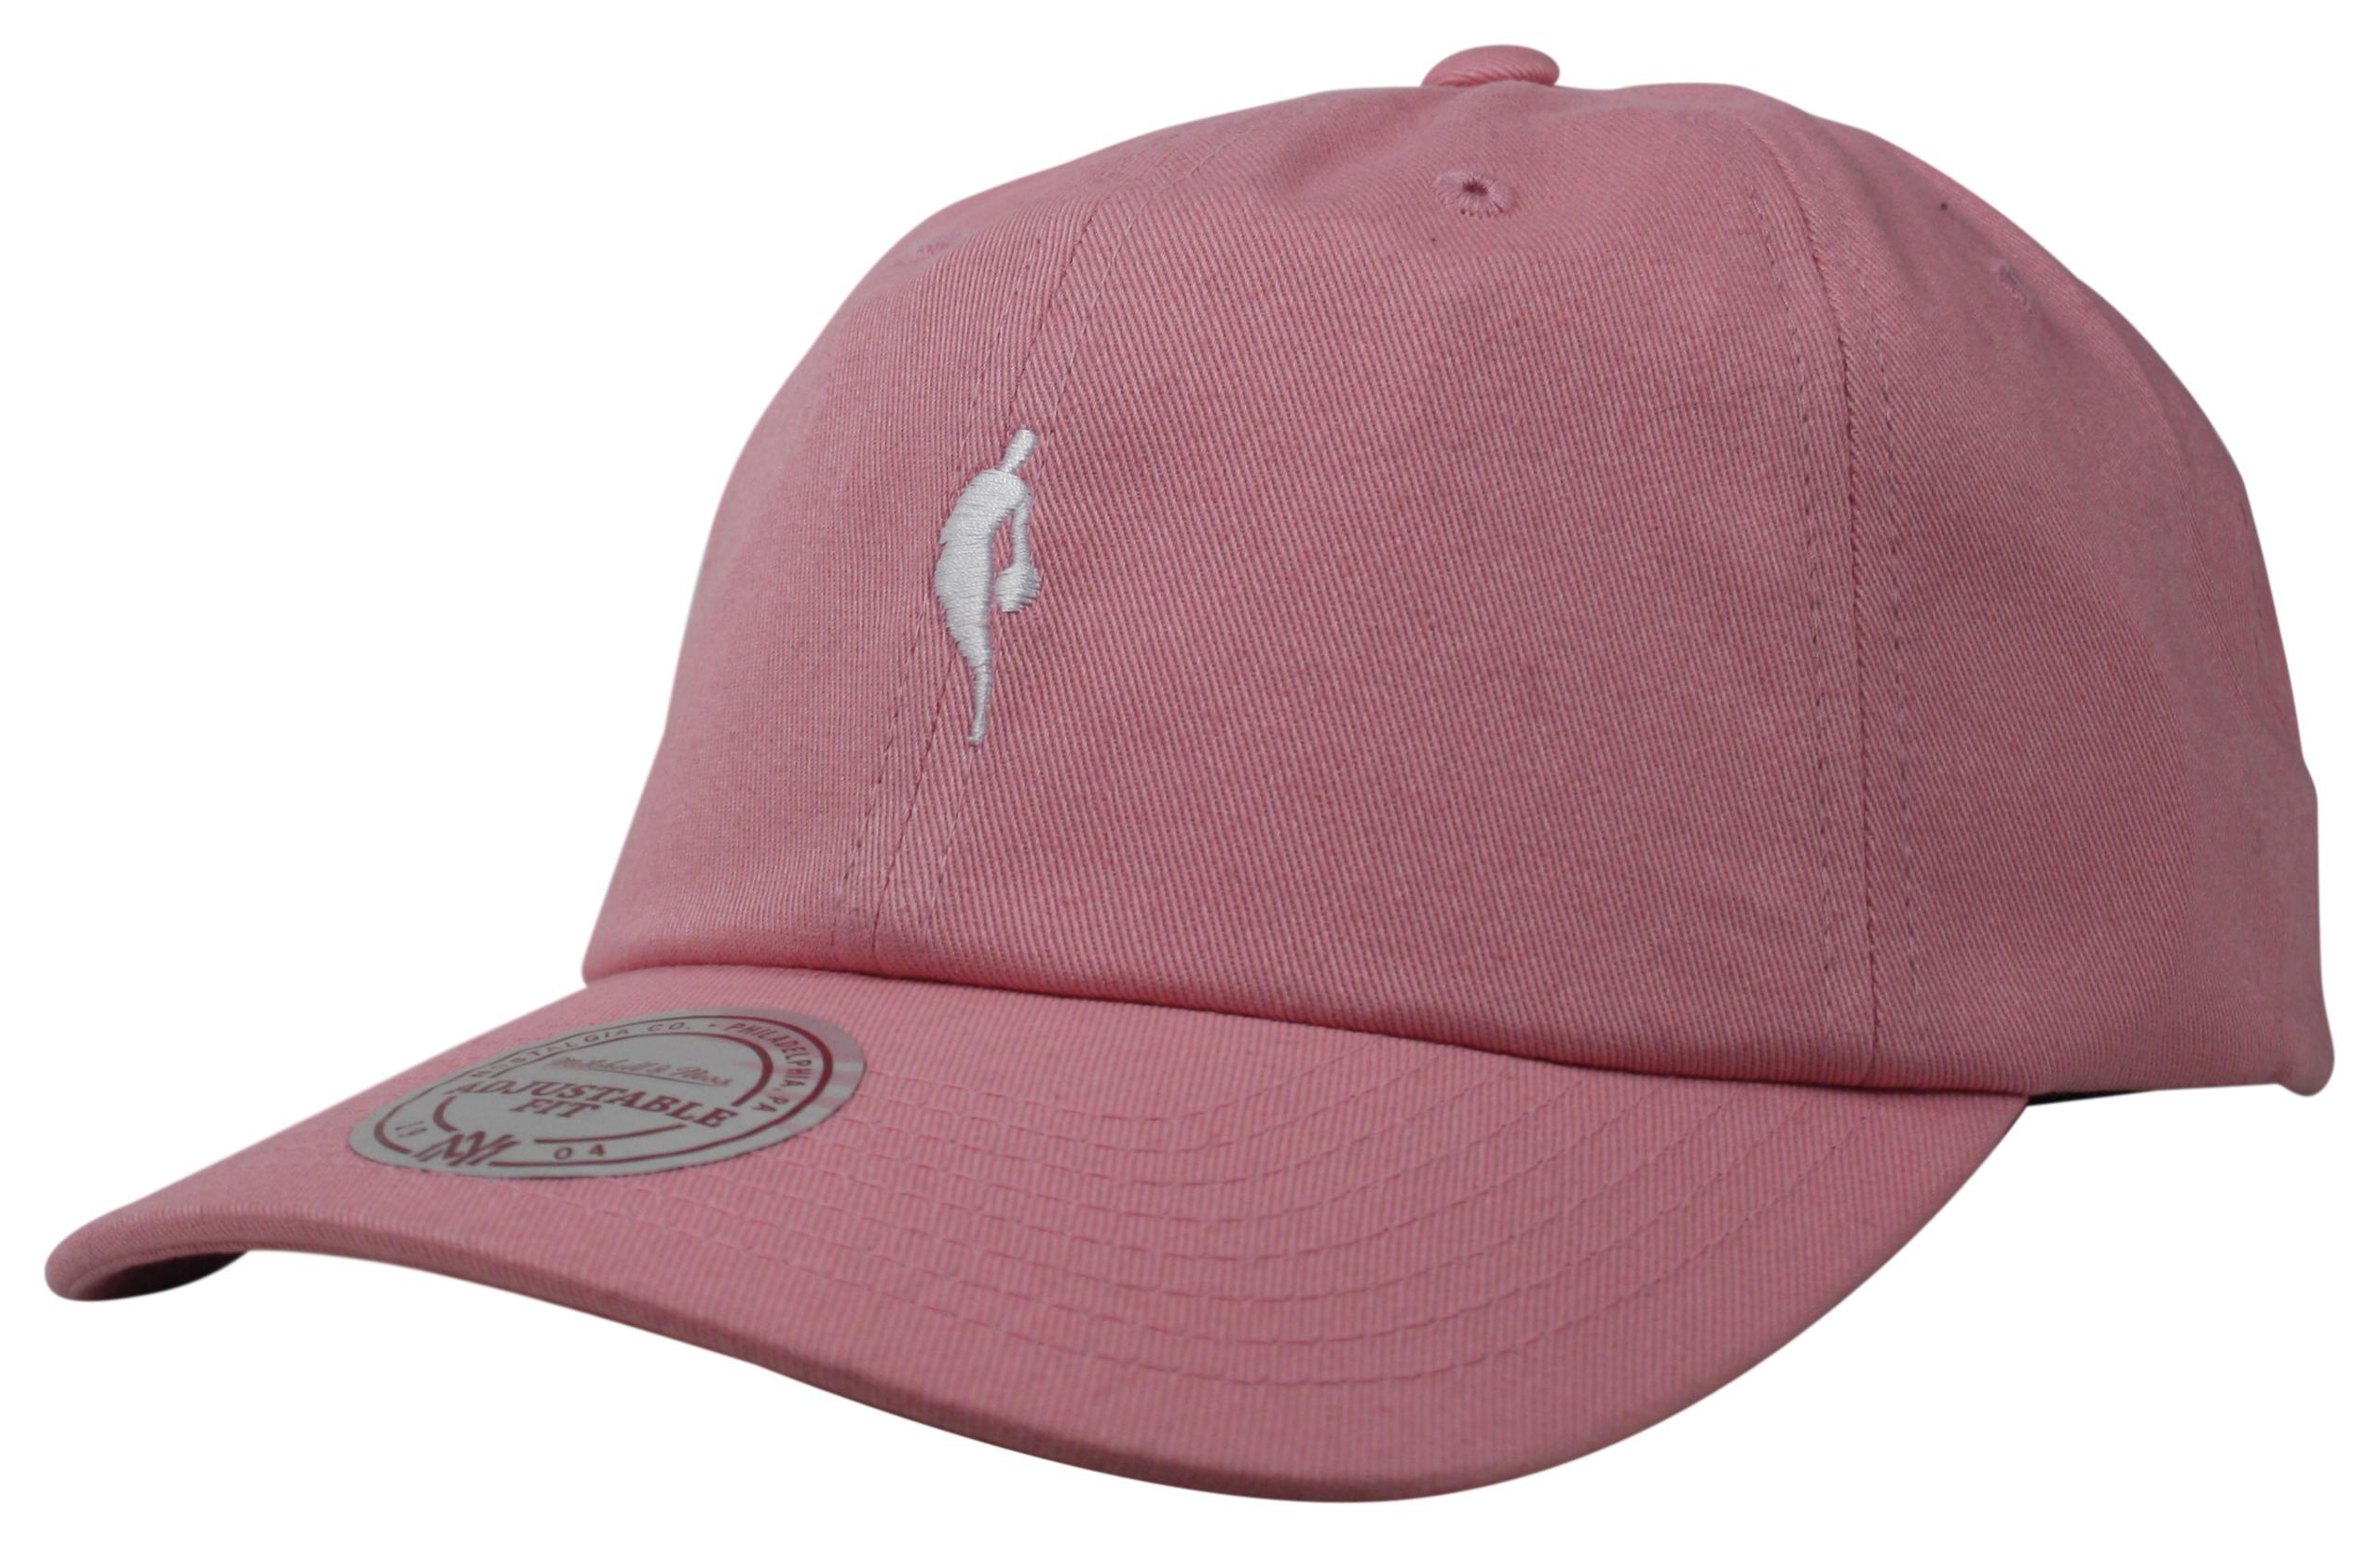 1fa90d82 Mitchell & Ness | NBA Logoman Pink Little Dribbler Dad Hat Snapback